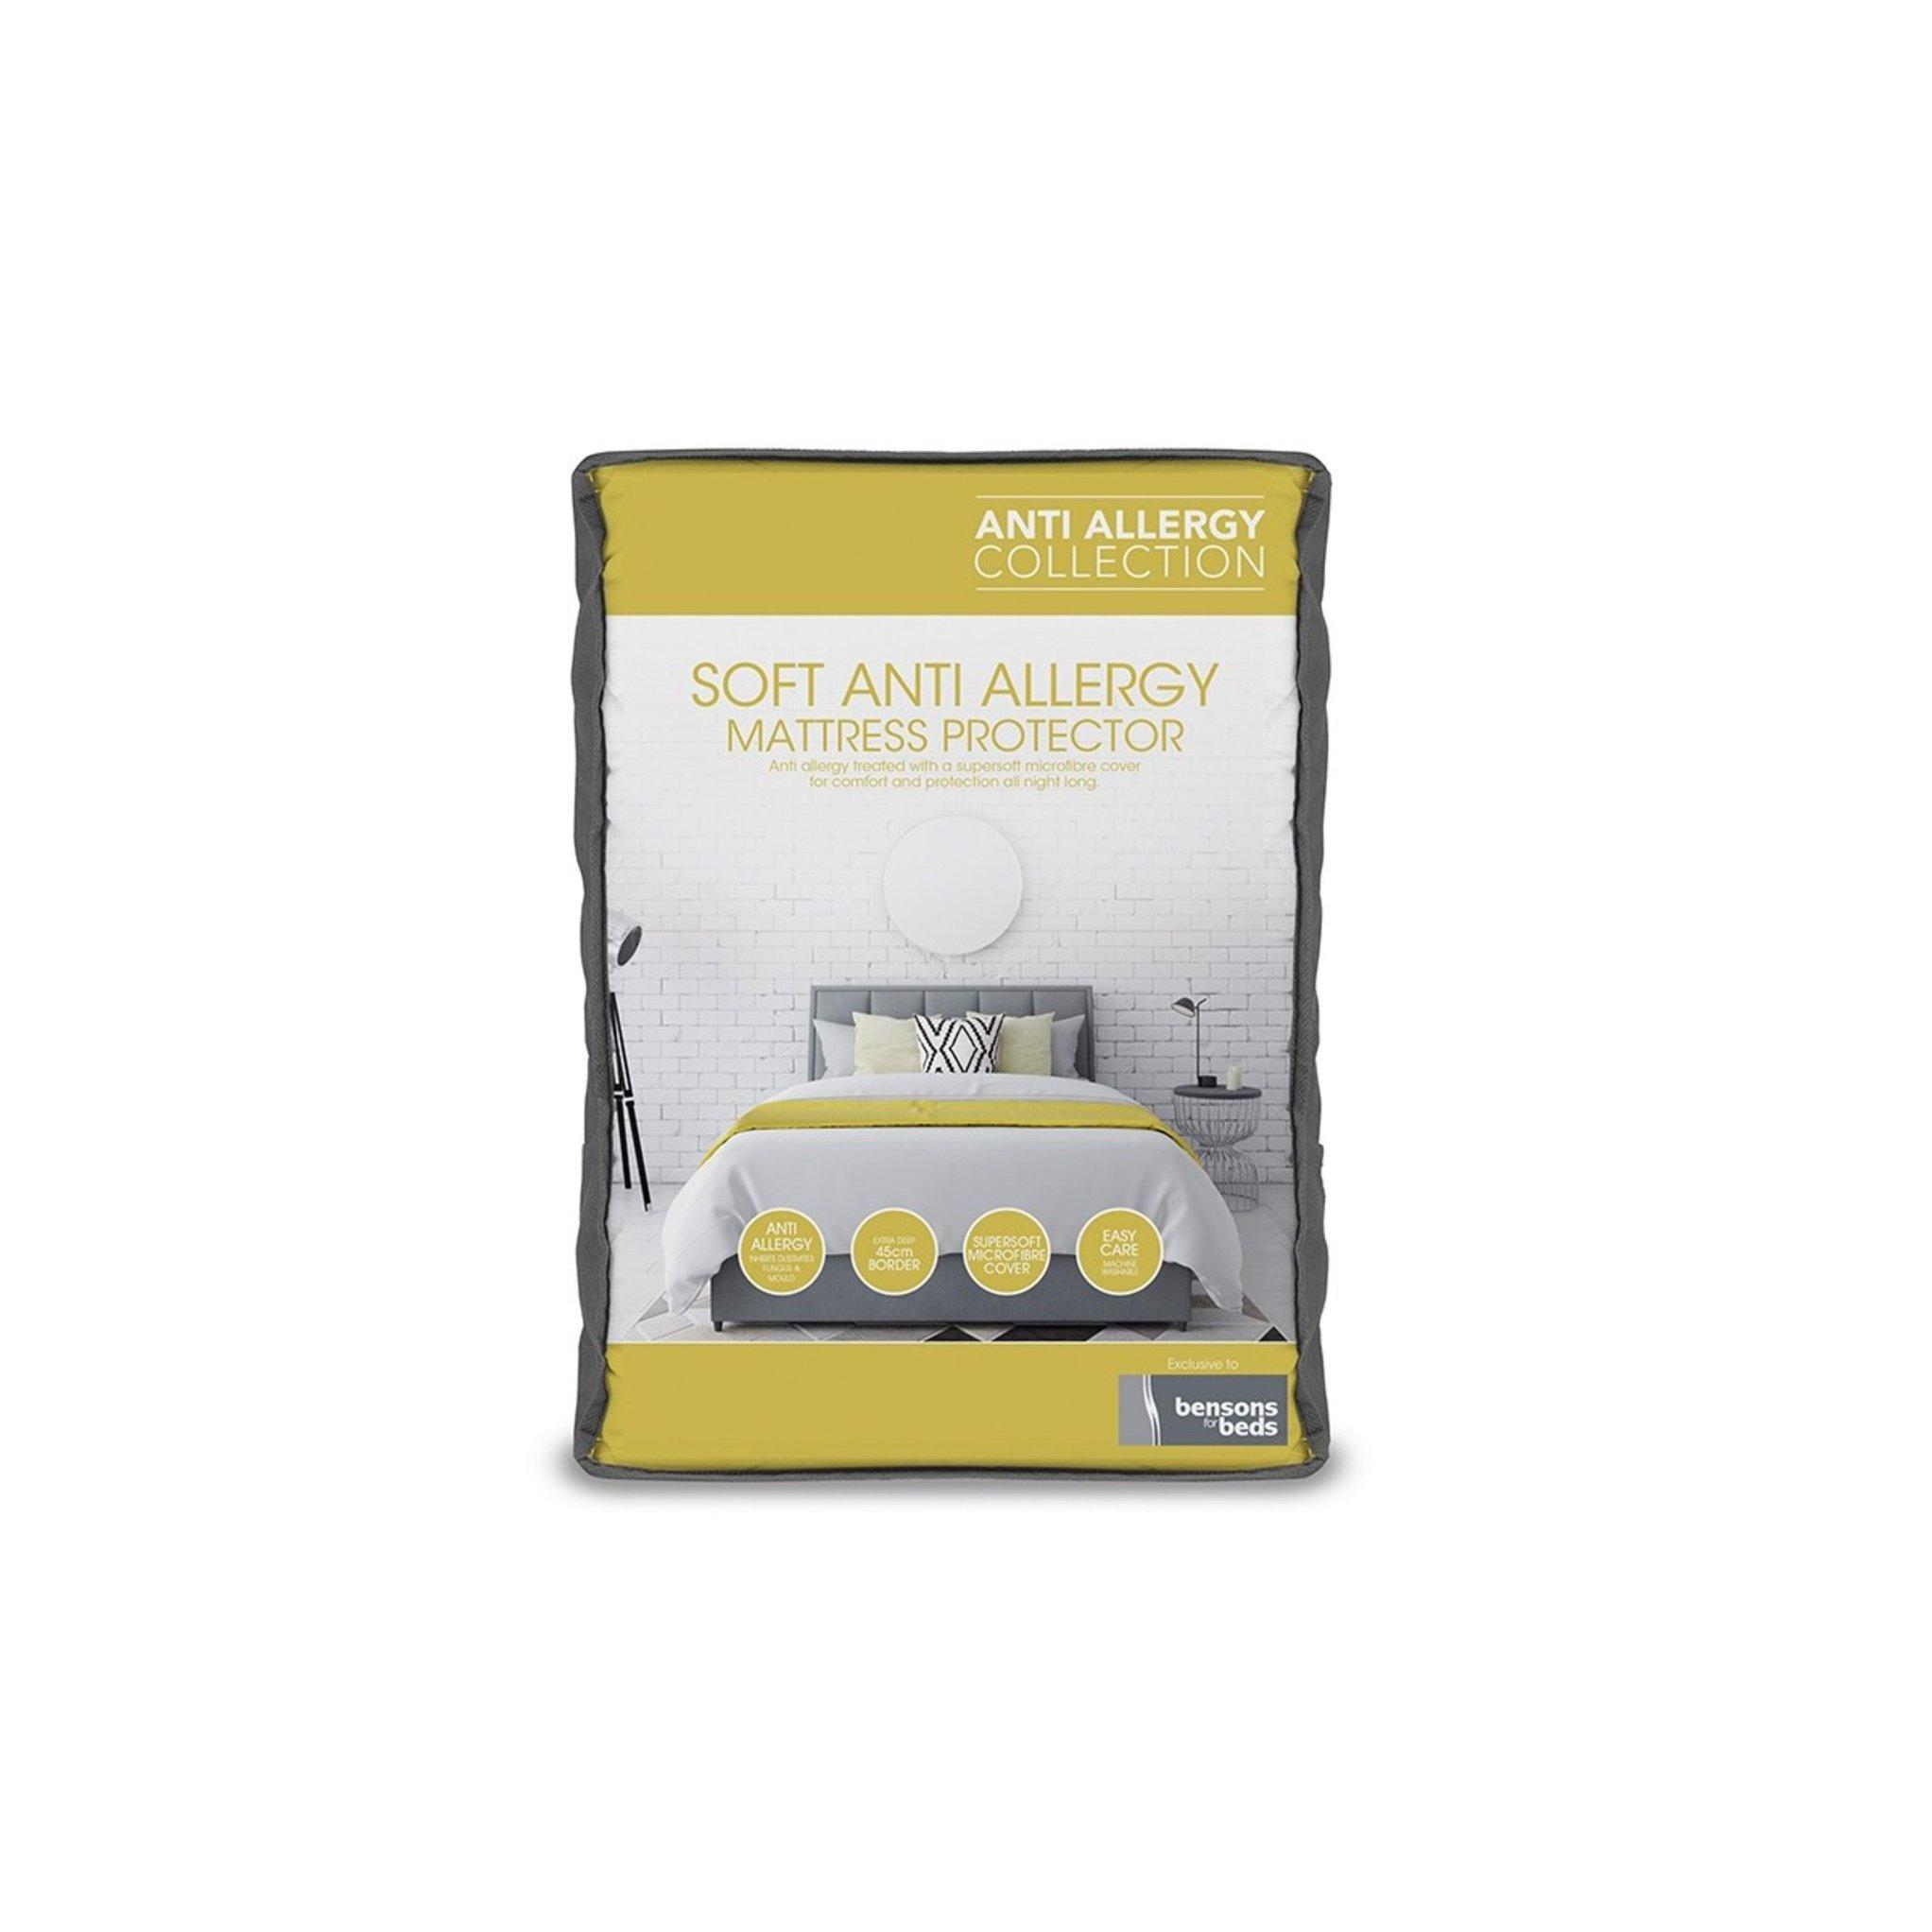 image-Anti-Allergy Mattress Protector